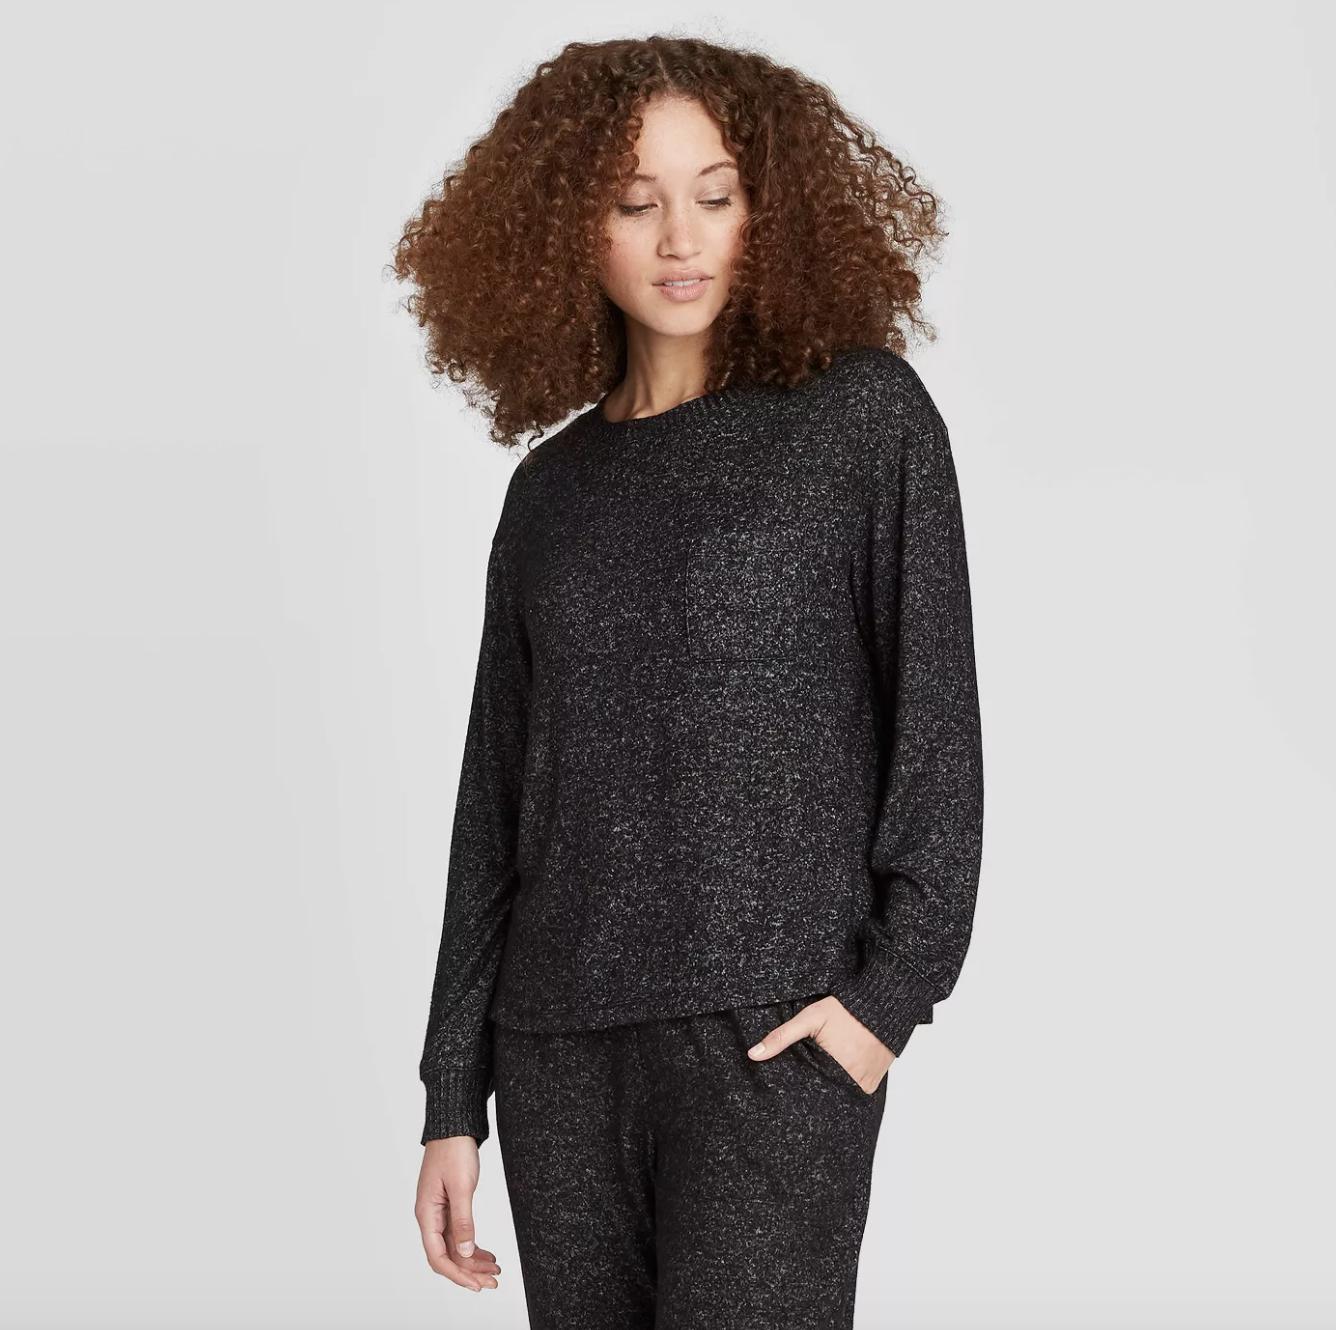 model wearing the lounge sweatshirt in charcoal